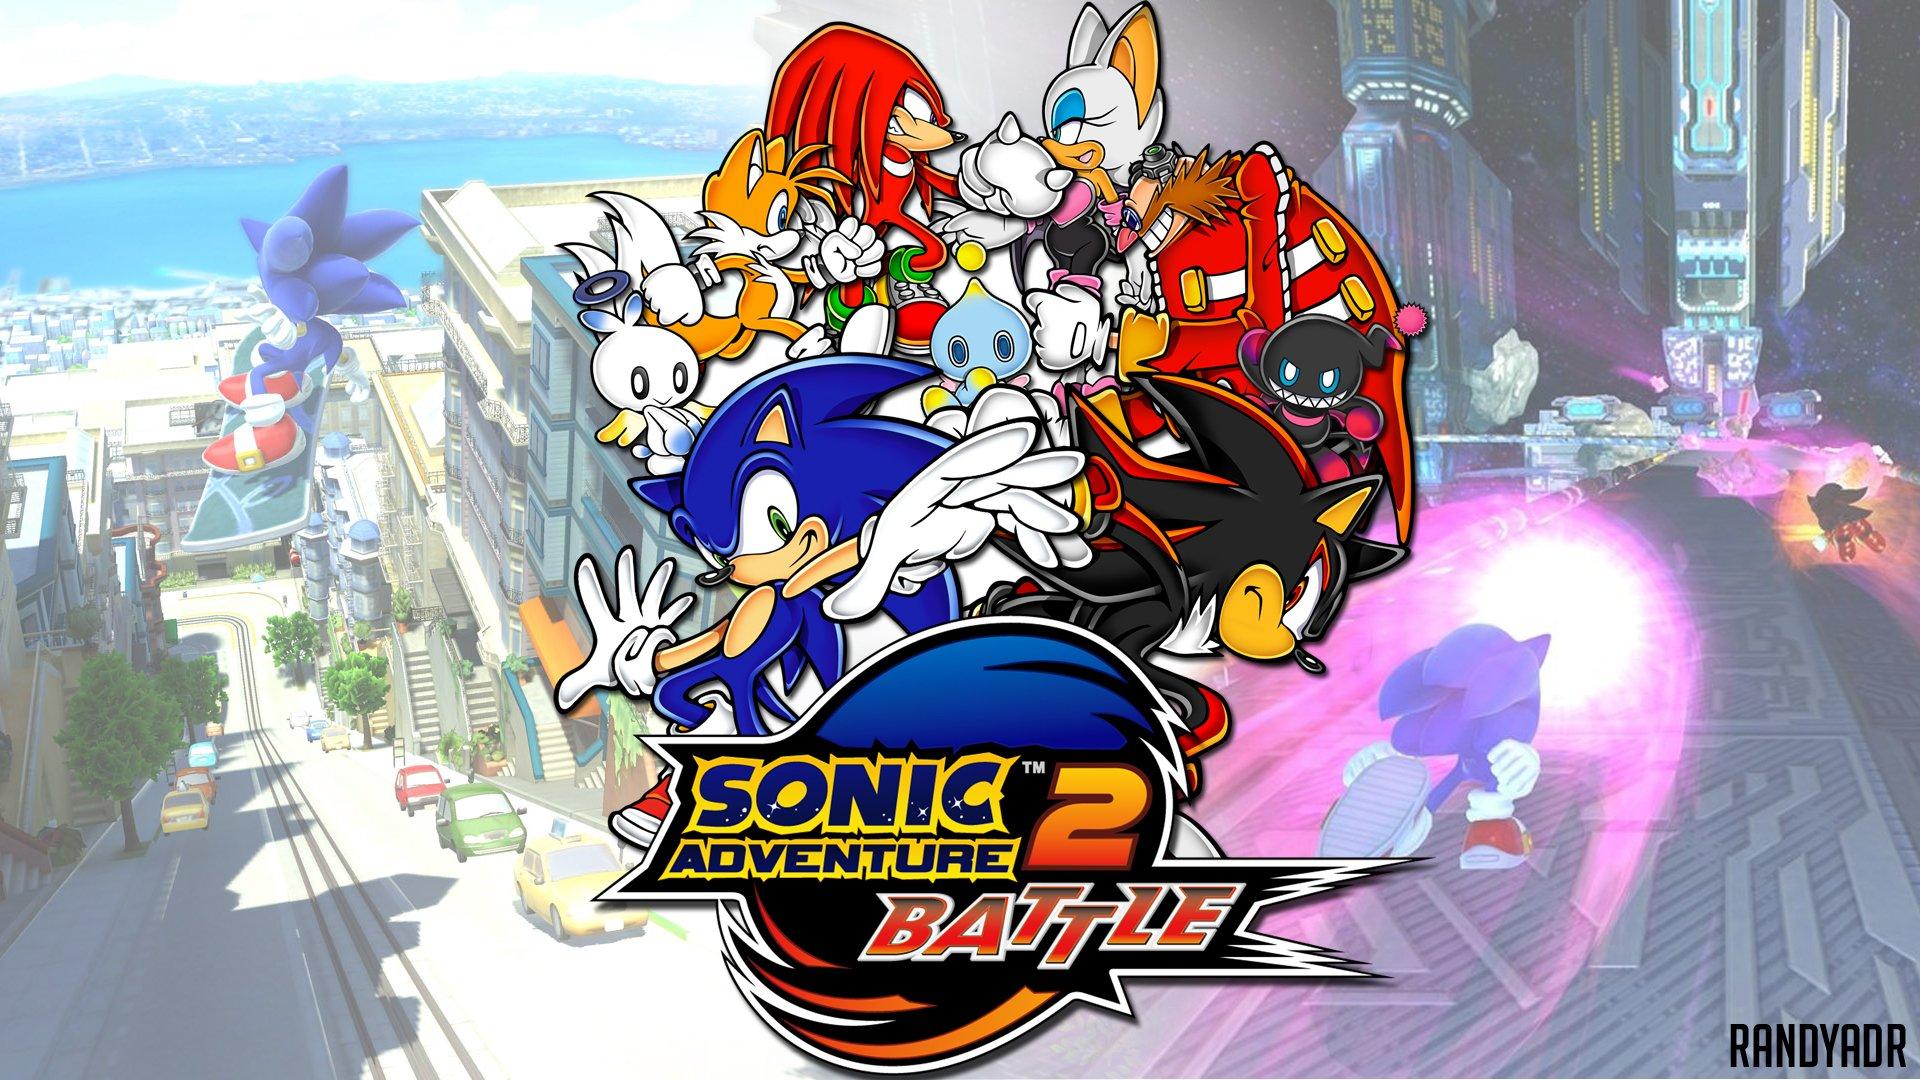 3 Sonic Adventure 2 Battle HD Wallpapers